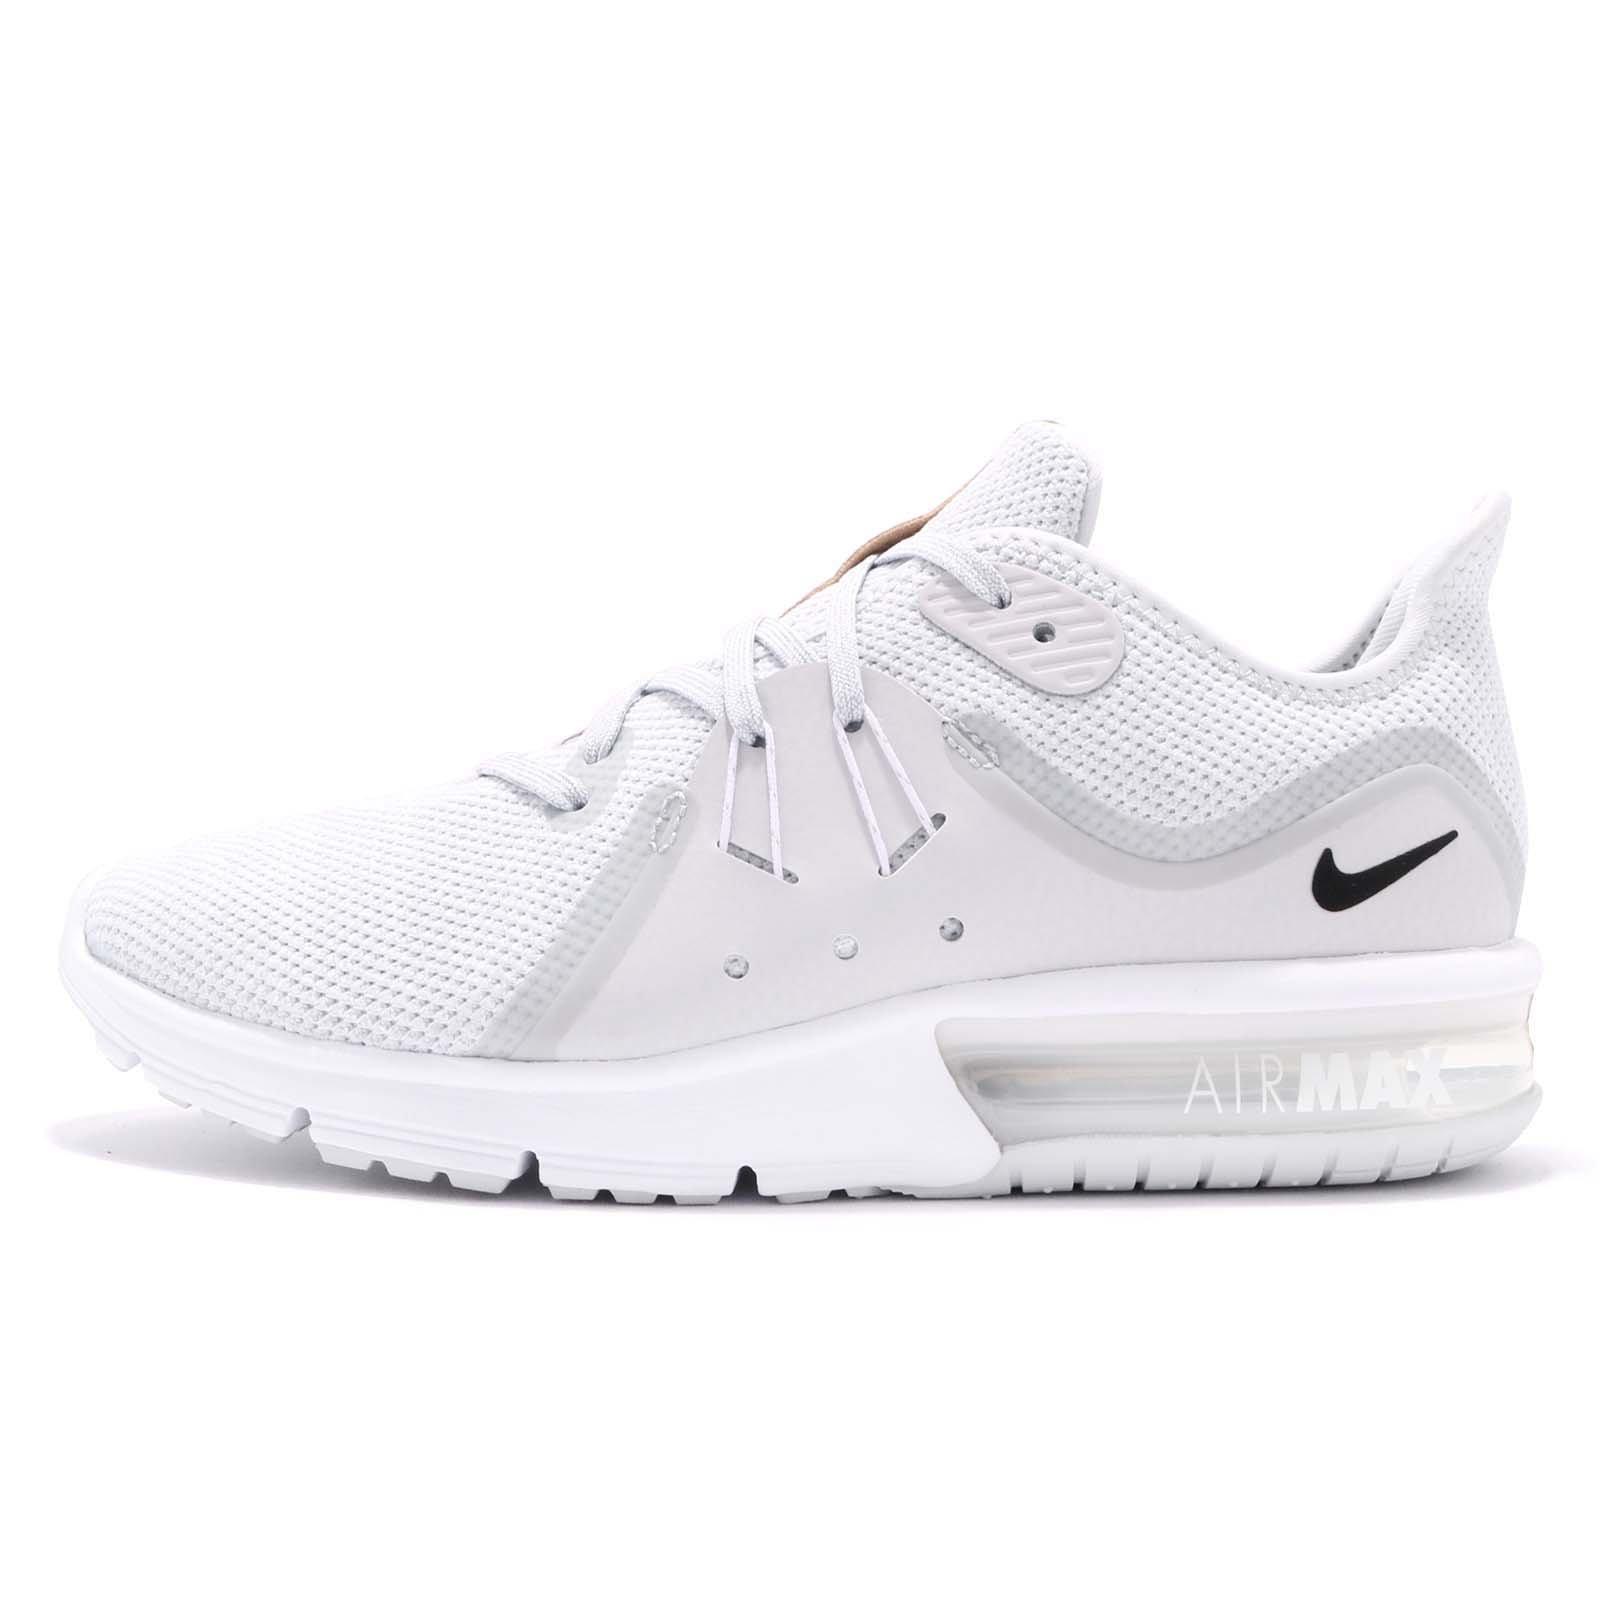 sports shoes 09d9c 7471e Galleon - Nike Air Max Sequent 3 (12, Pure Platinum Black White 2)